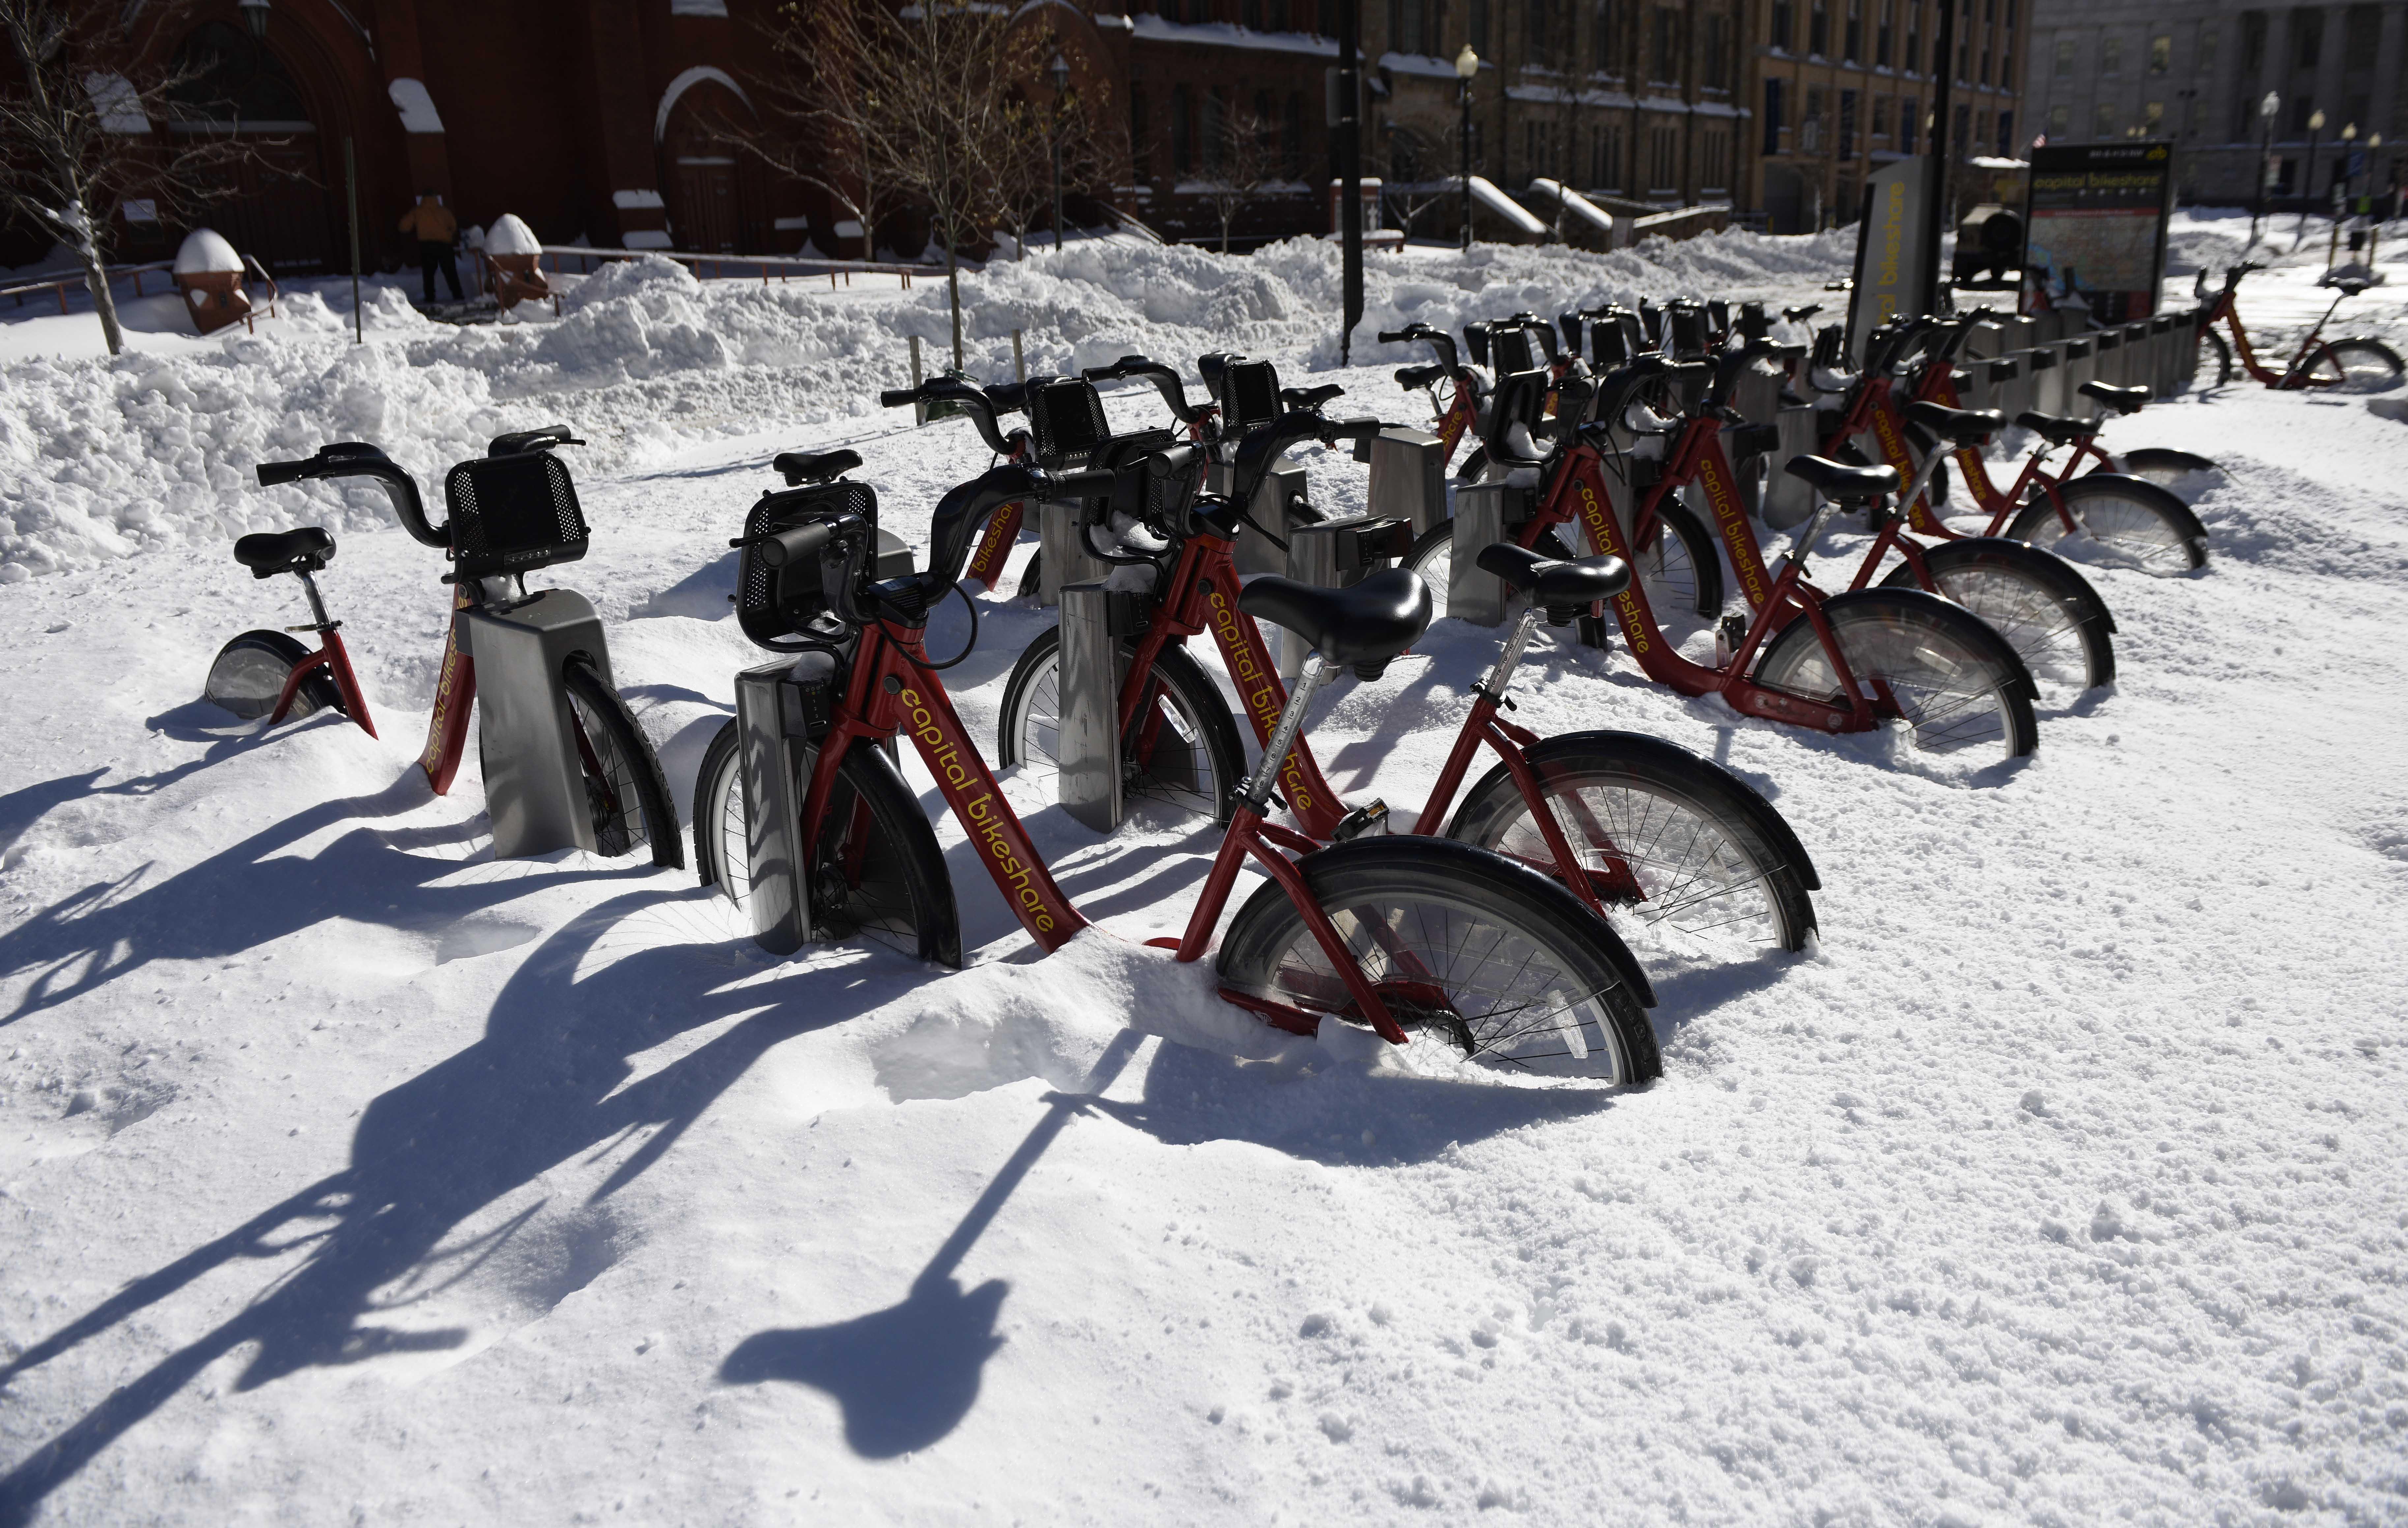 Bikes buried in snow in Washington